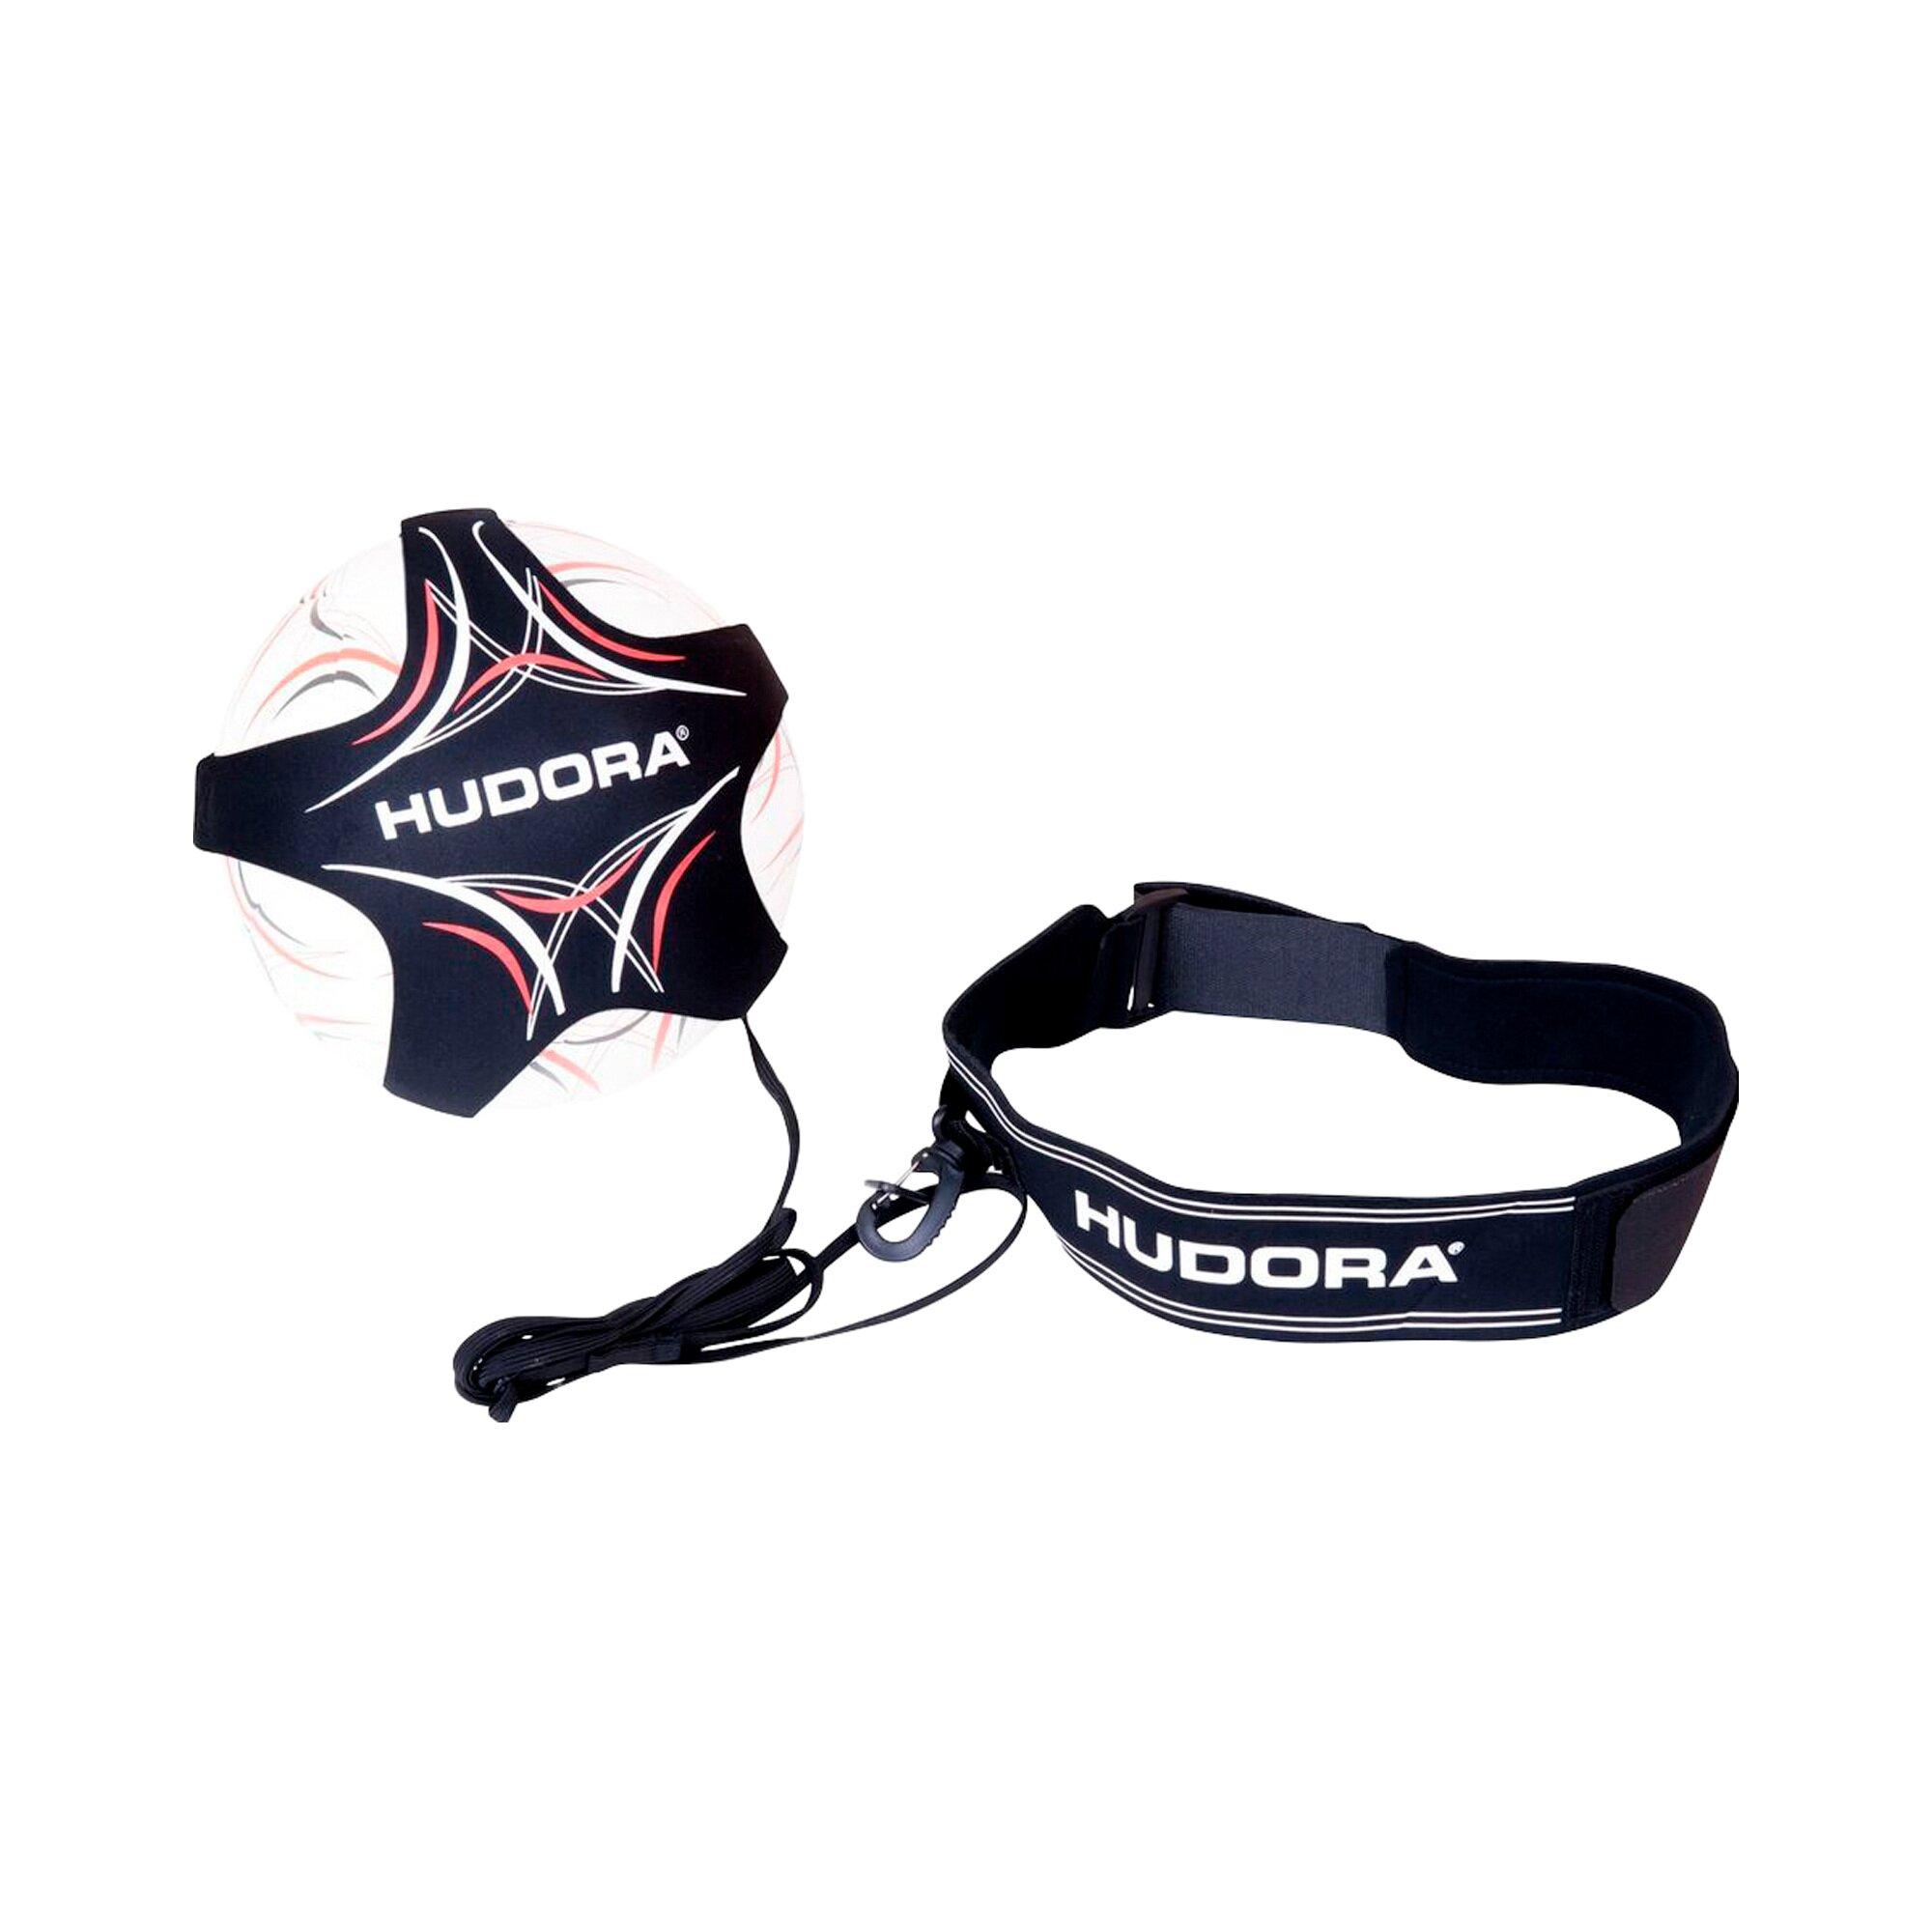 hudora-fu-ball-rebound-trainer